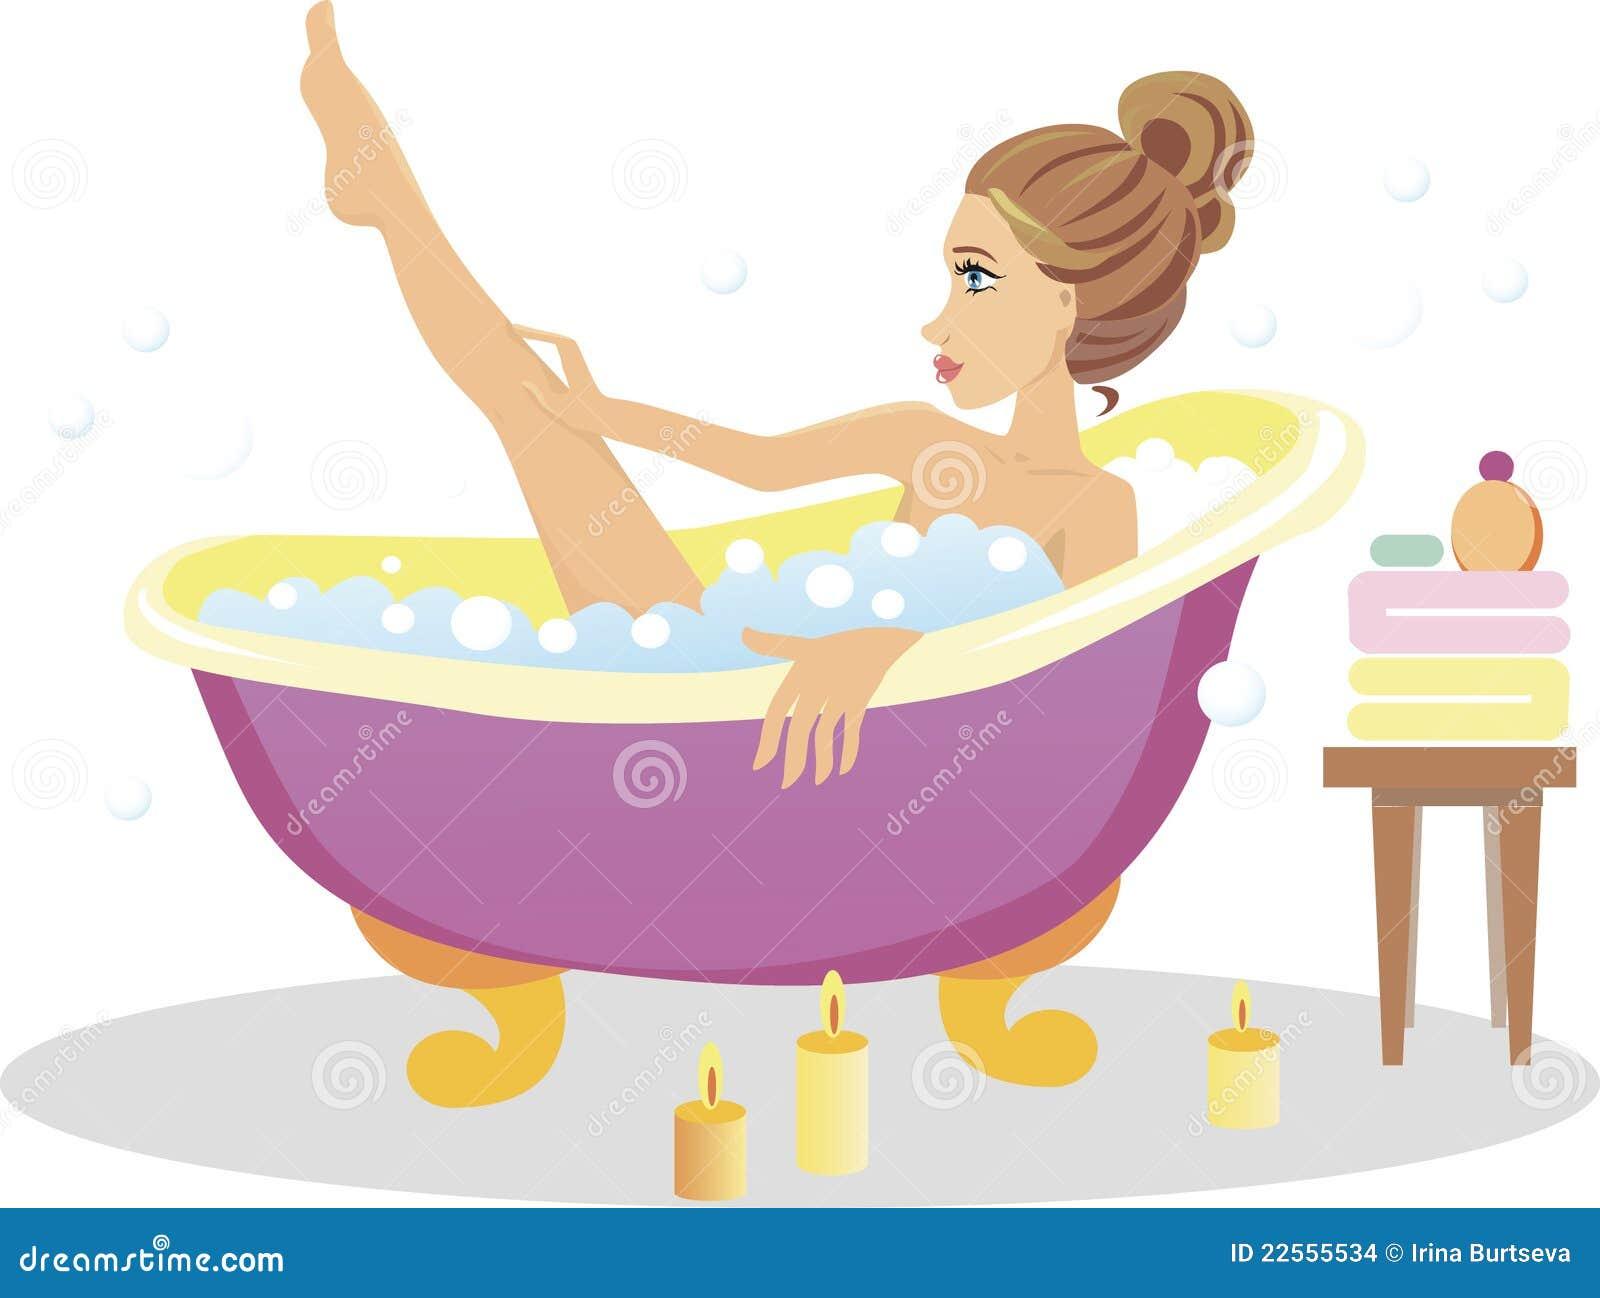 girl taking a bath stock vector illustration of style 22555534. Black Bedroom Furniture Sets. Home Design Ideas